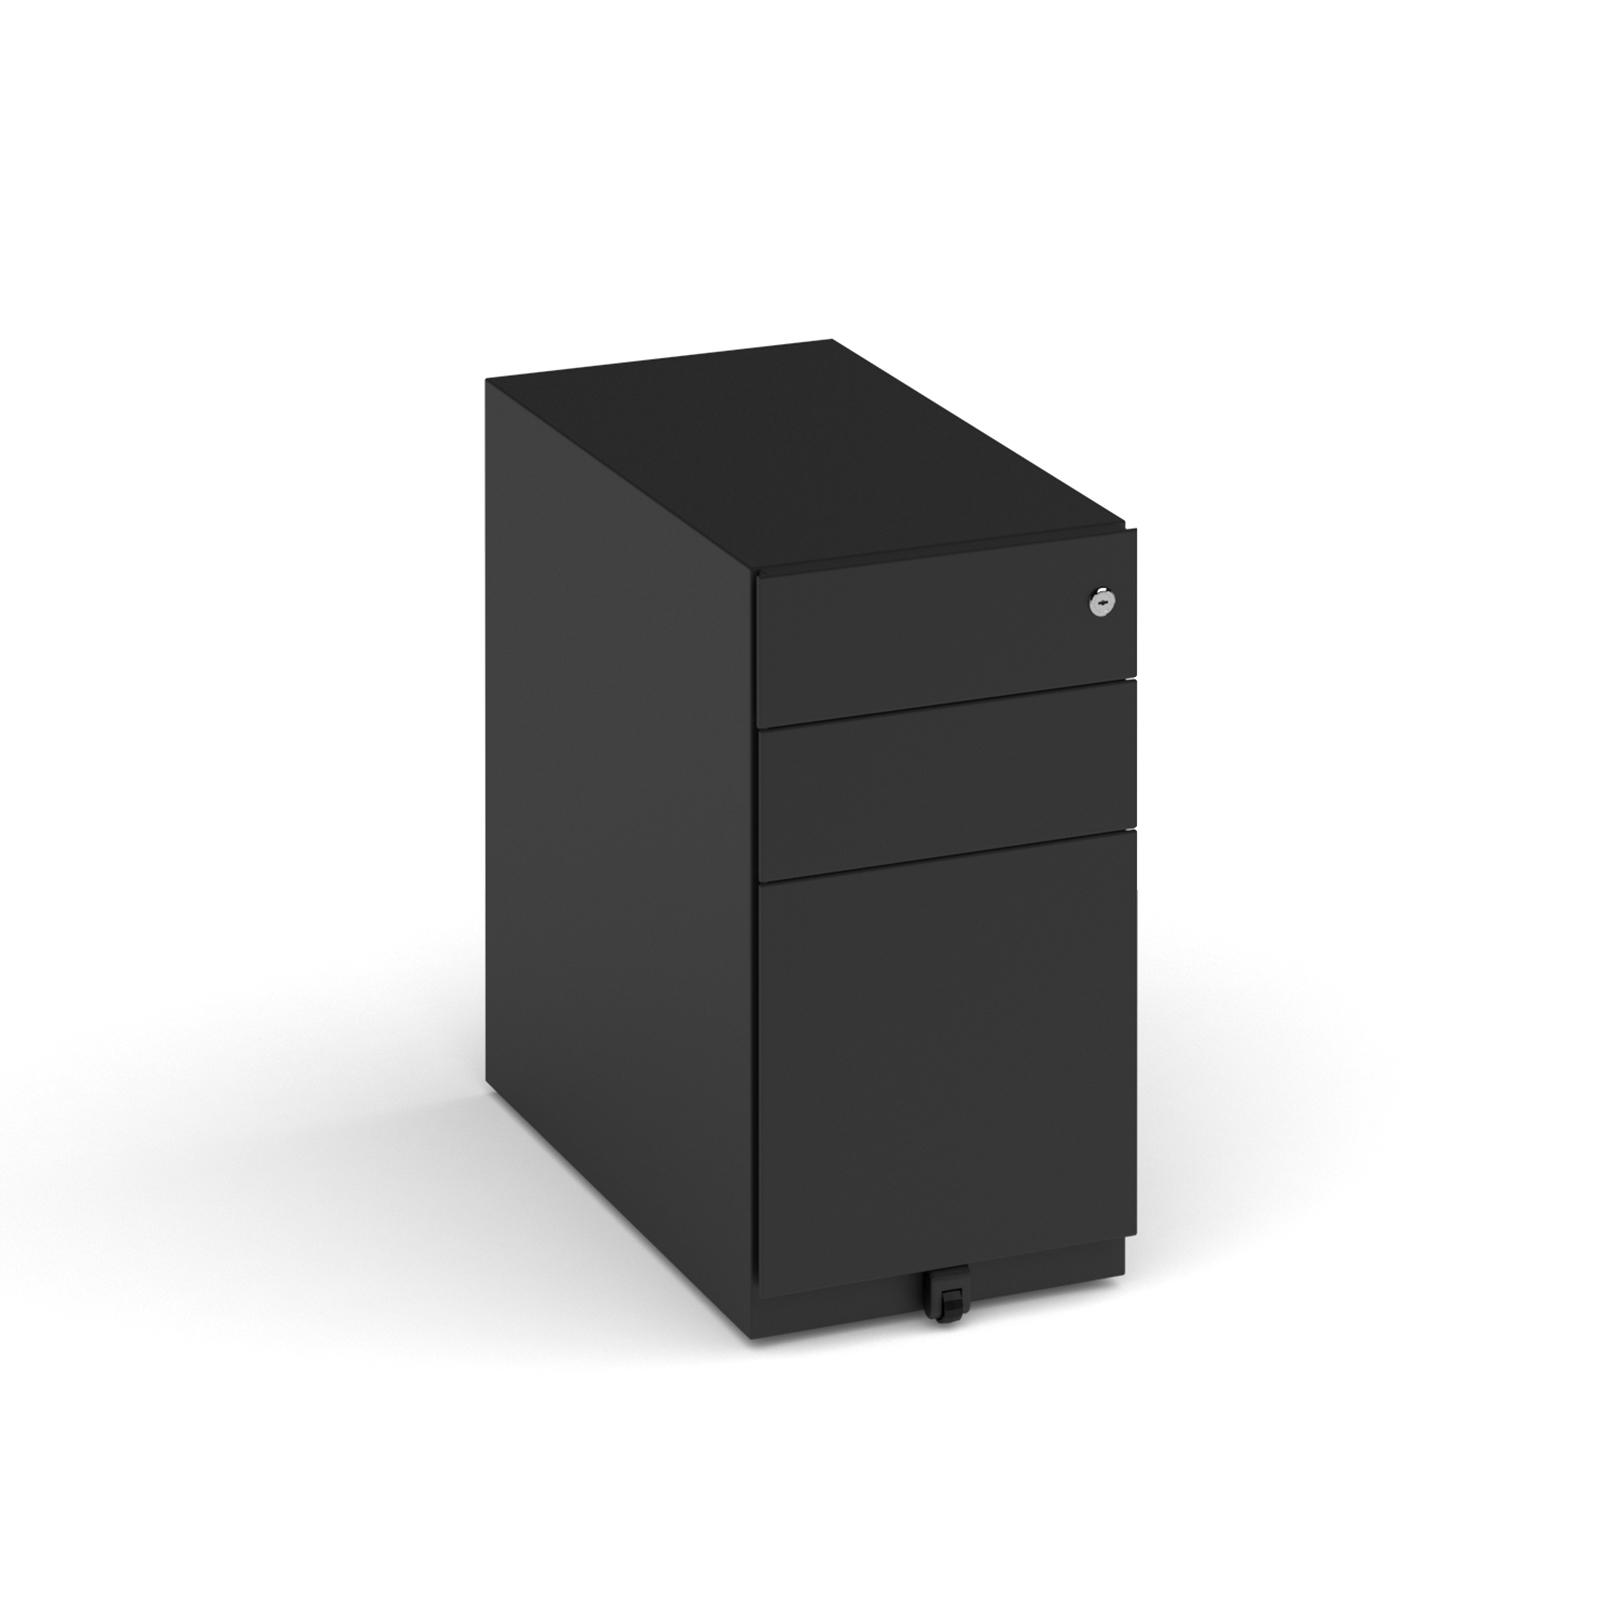 Bisley slimline steel pedestal 300mm wide - black